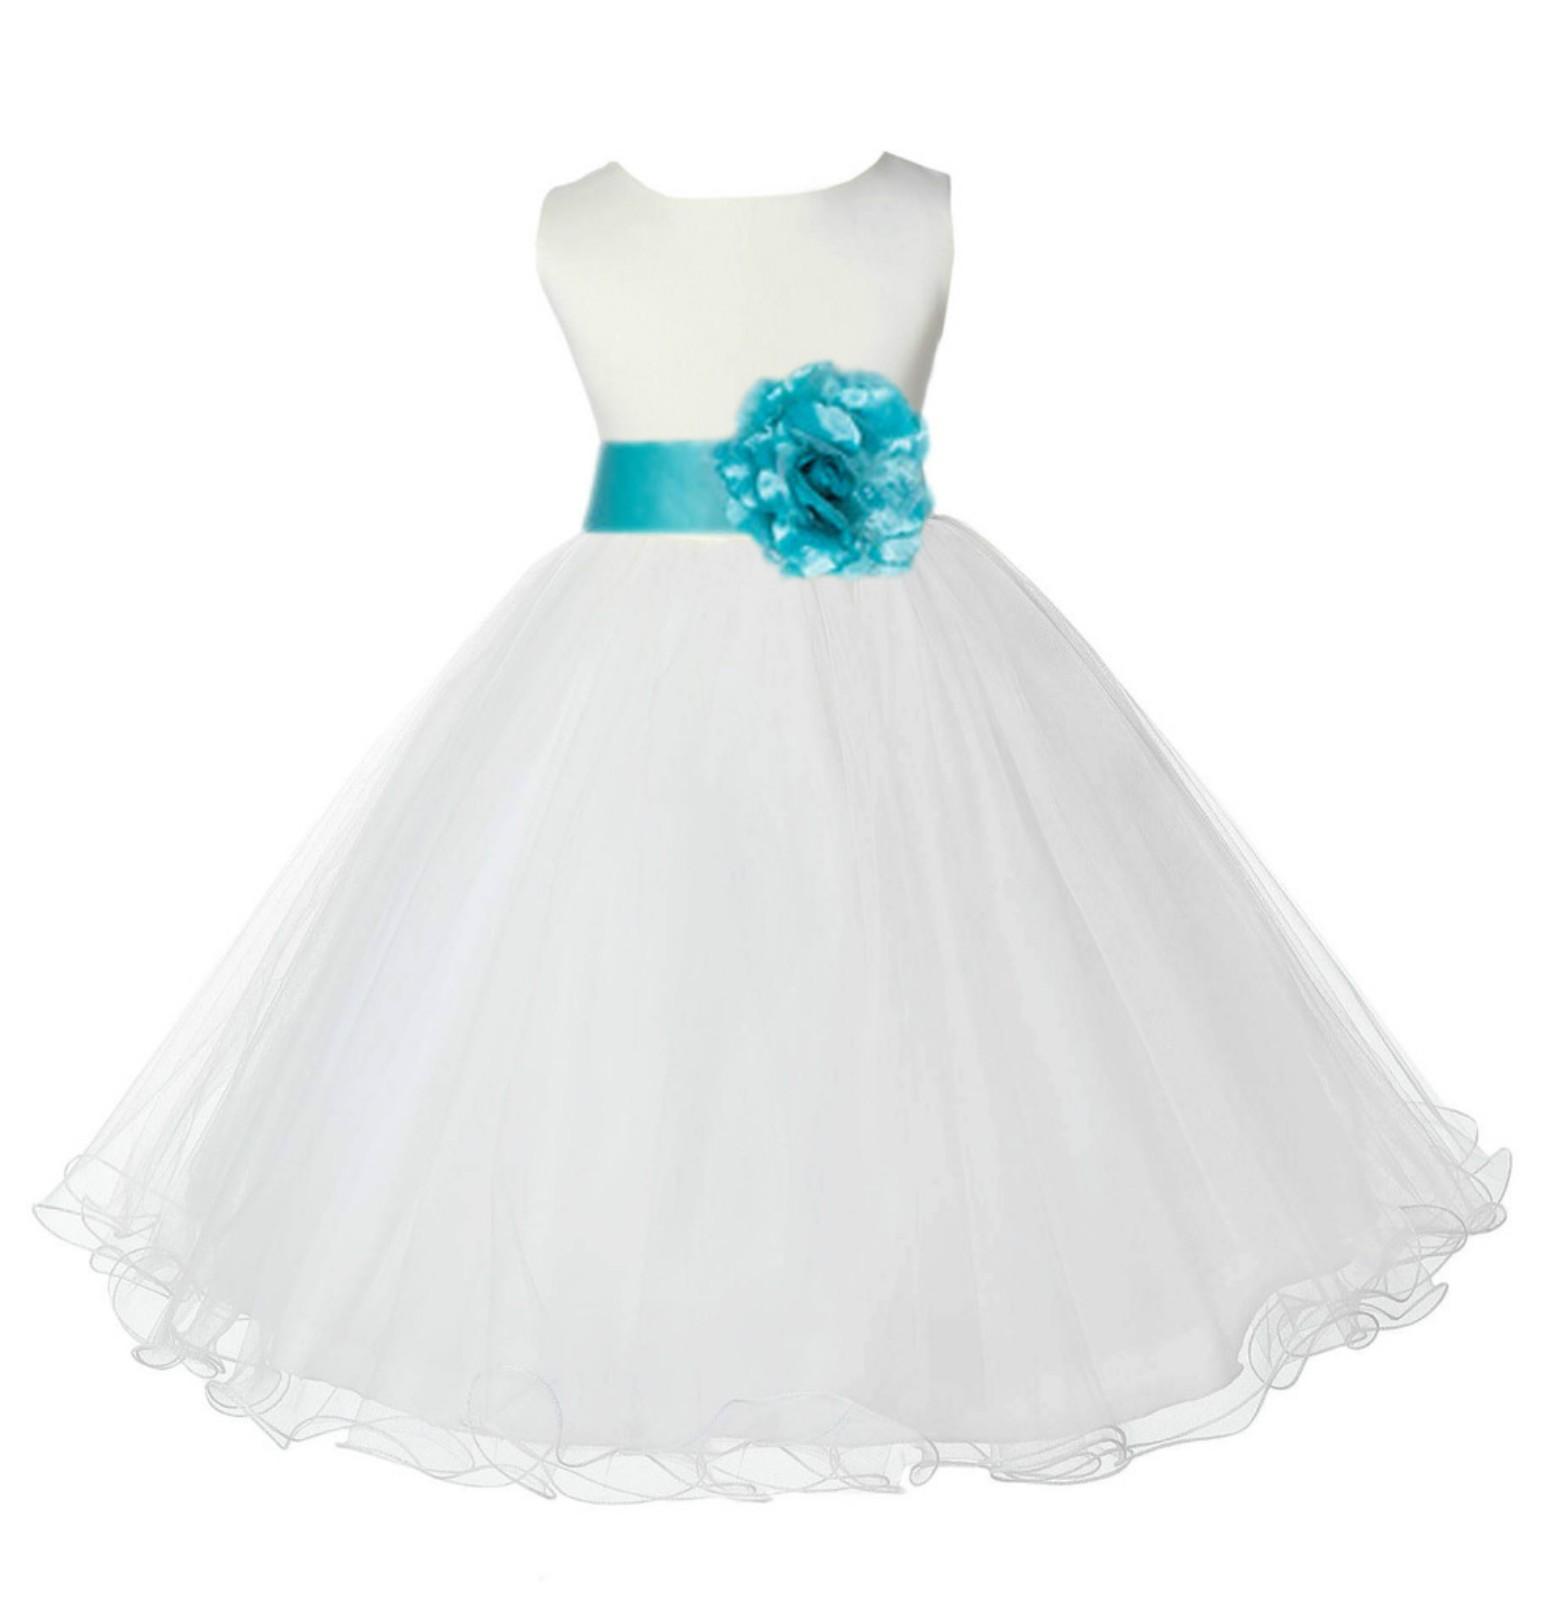 Ivorytiffany Tulle Rattail Edge Flower Girl Dress Pageant Recital 829s